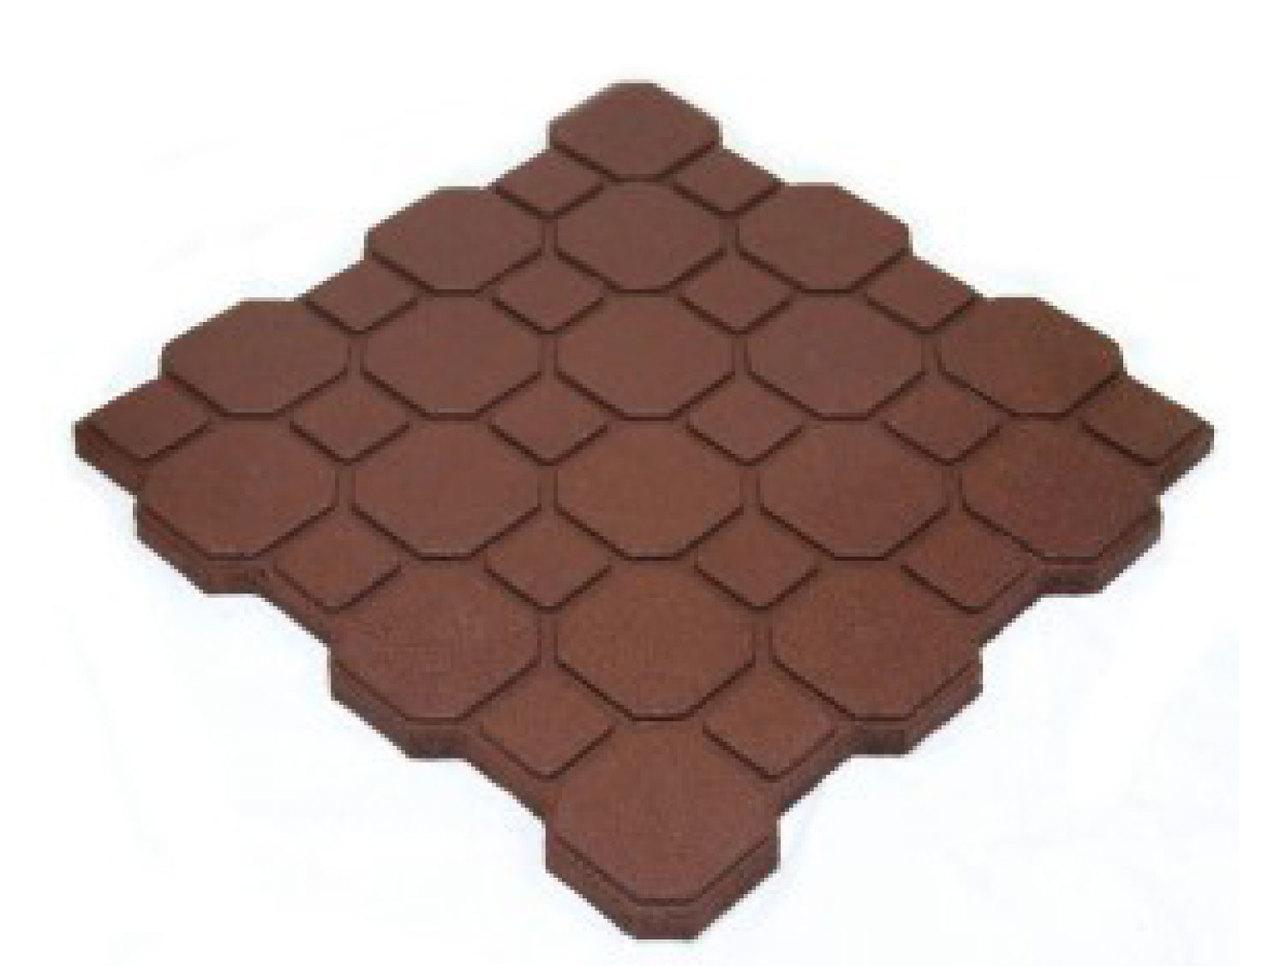 Cobblestone Rubber Tiles